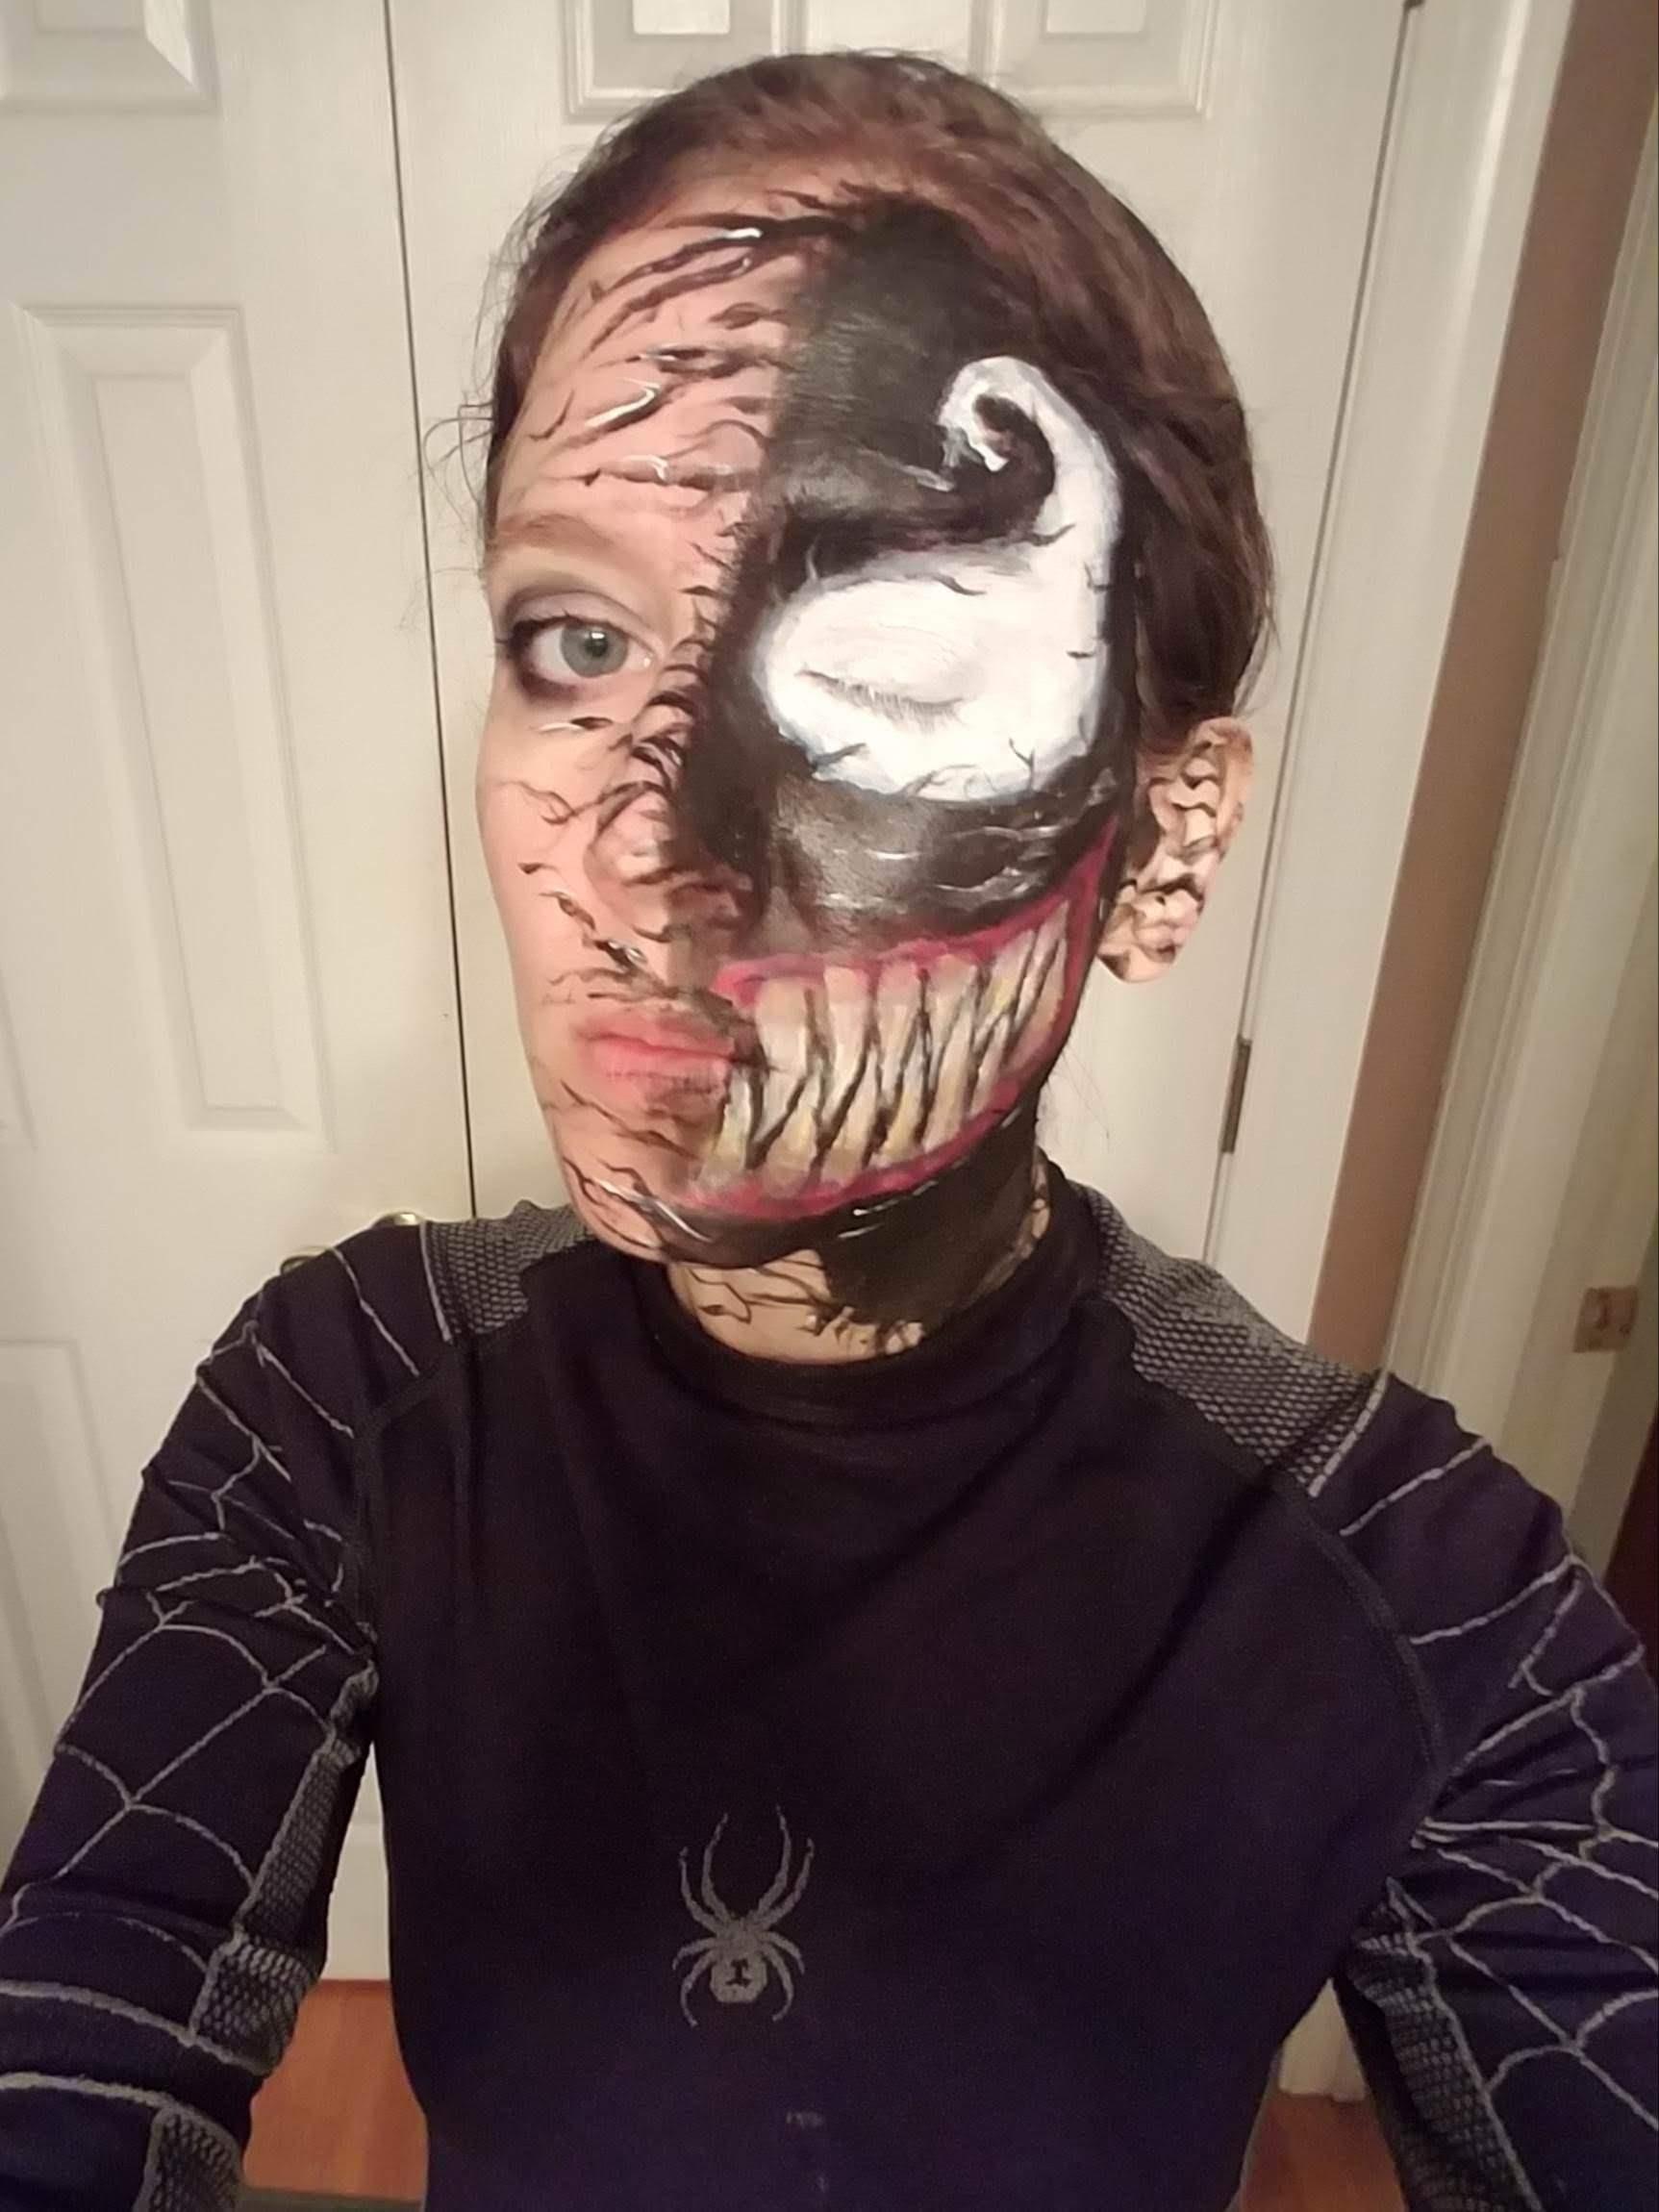 A High school librarian trying to scare students on Halloween as She-Venom : ハロウィンに女版ヴェノムのシーヴェノムとして登校し、学生たちにウケた高校の図書館にお勤めの司書の人 ! !